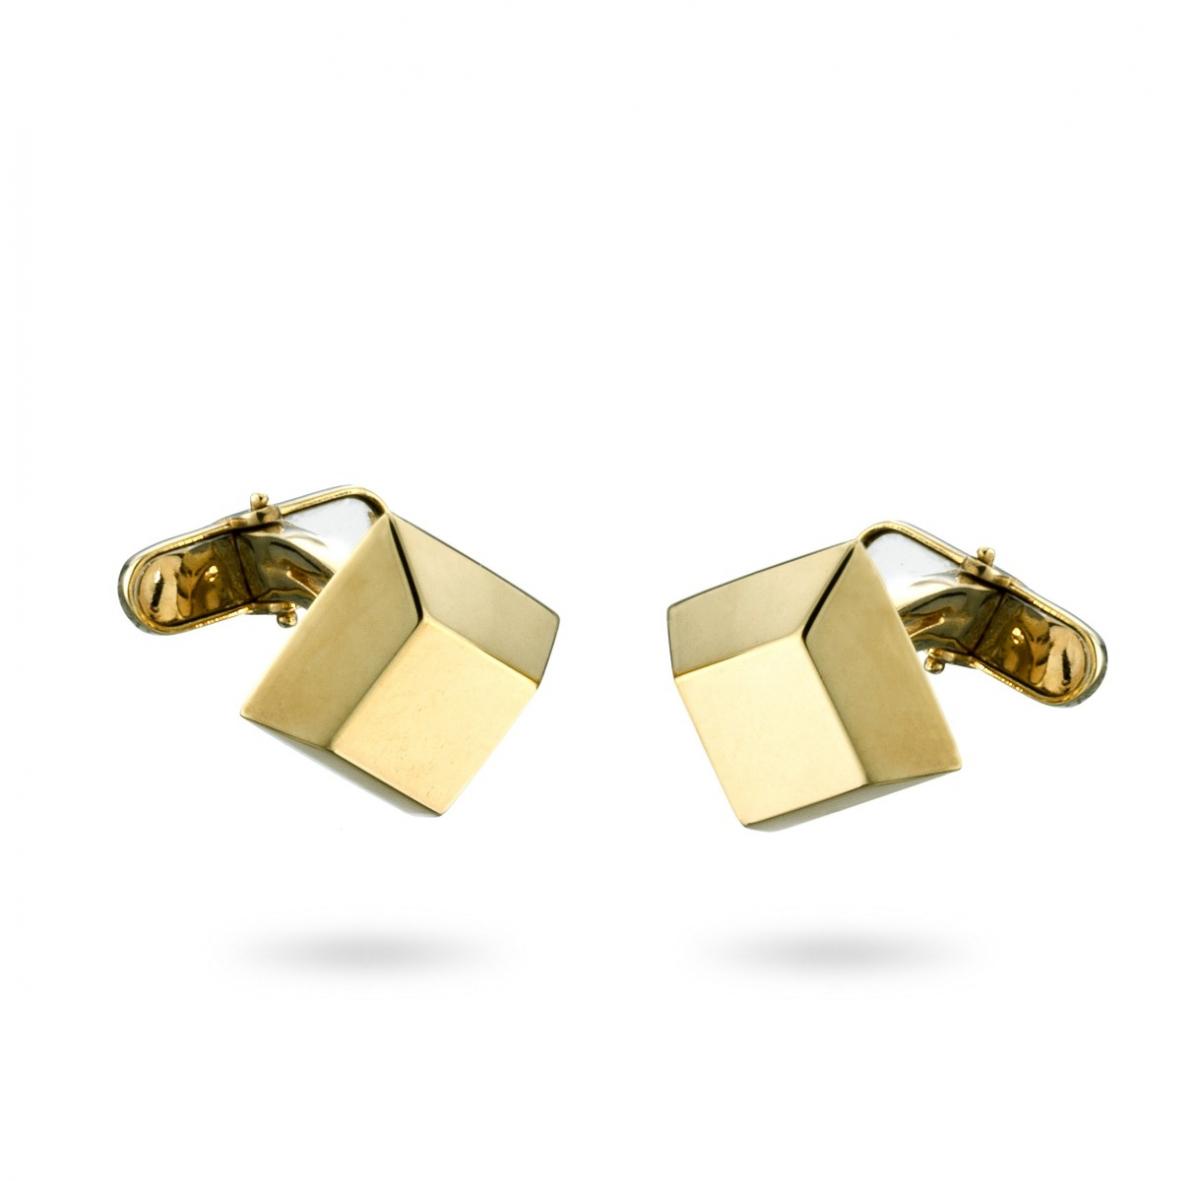 18Kt Gold Ingot Cufflinks